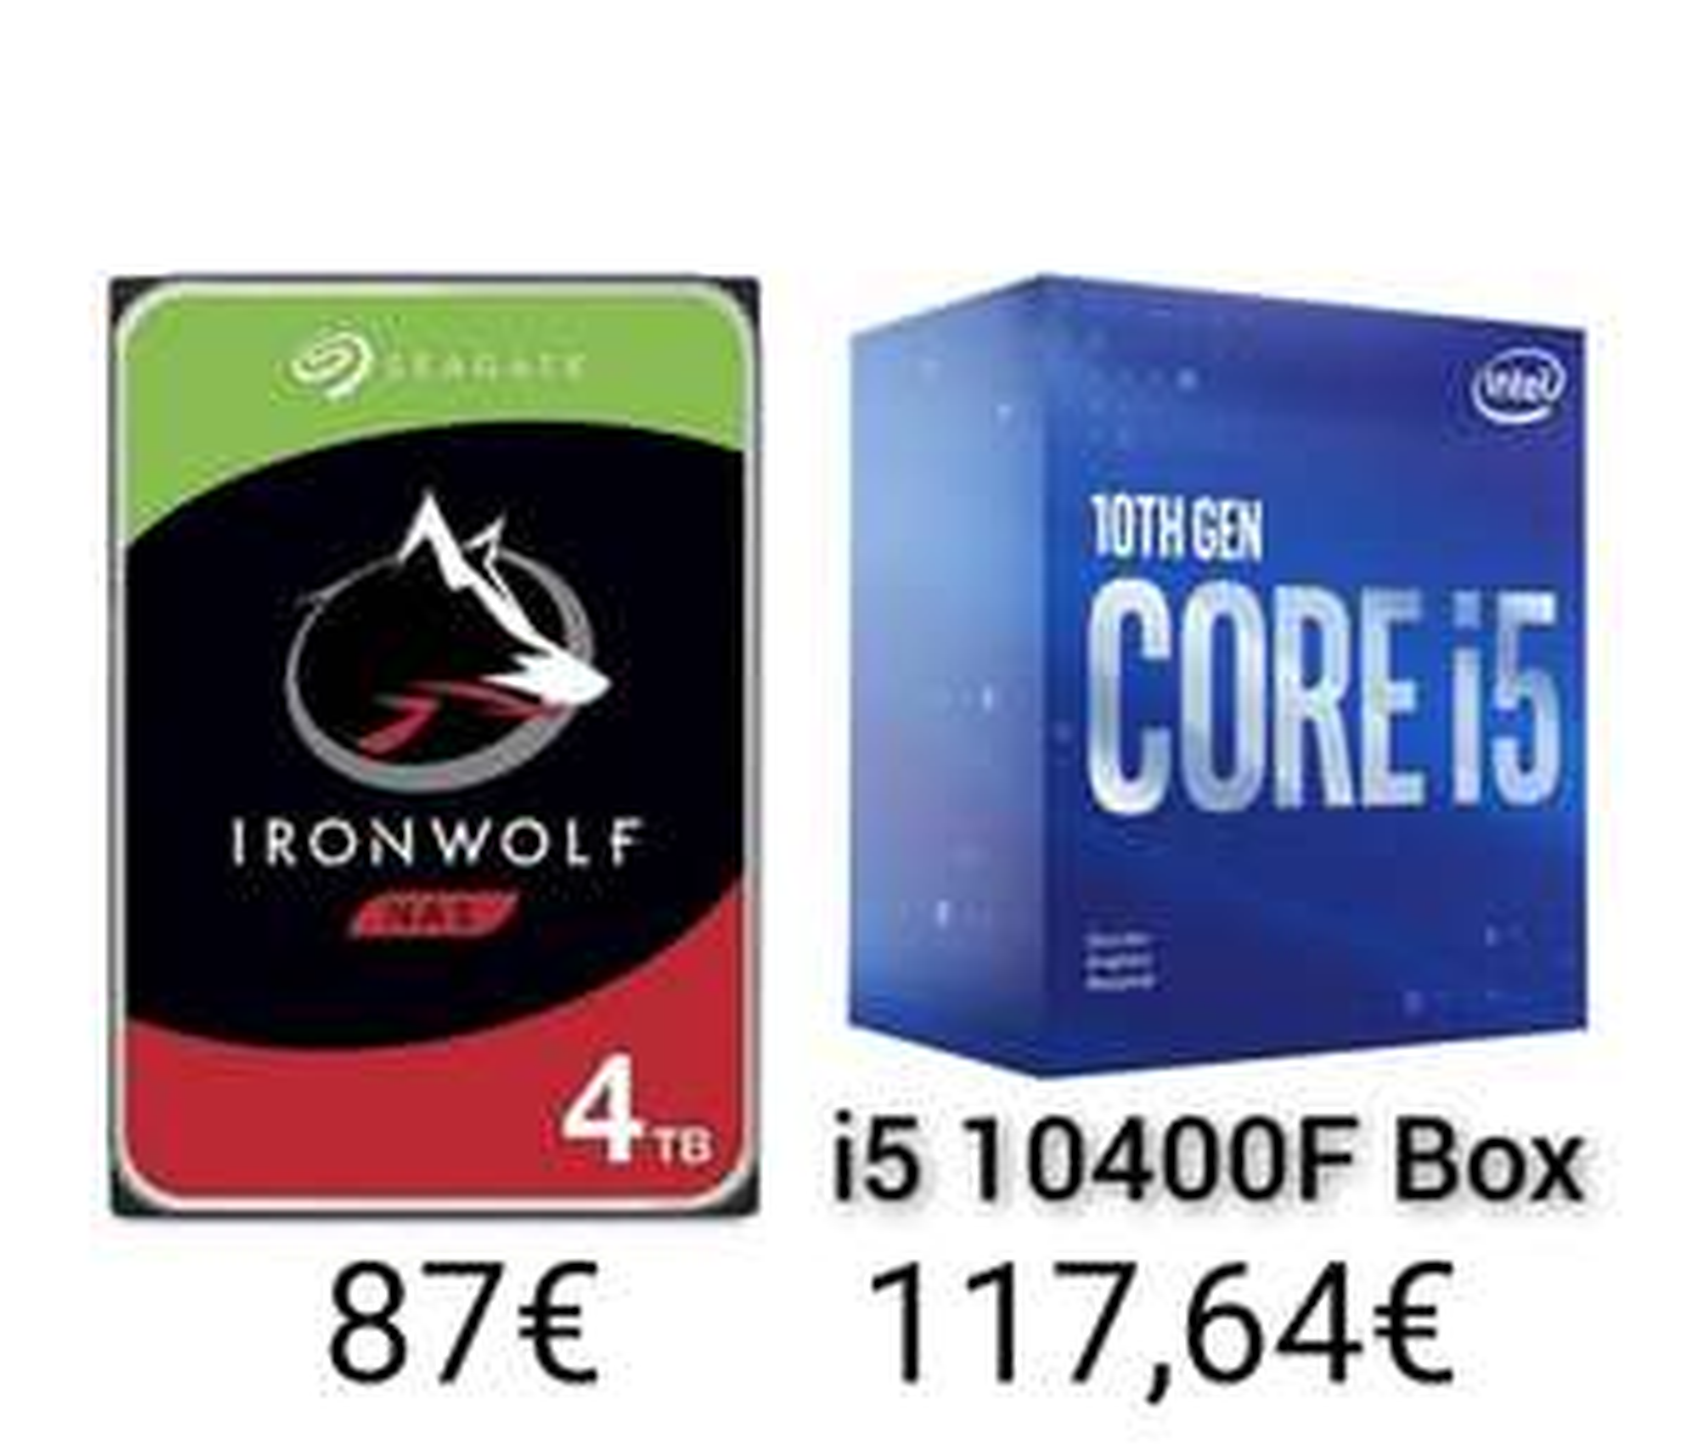 "Seagate Ironwolf 4TB 3,5"" NAS HDD (CMR) 87€ / Intel Core i5 10400F Box 117,64€"